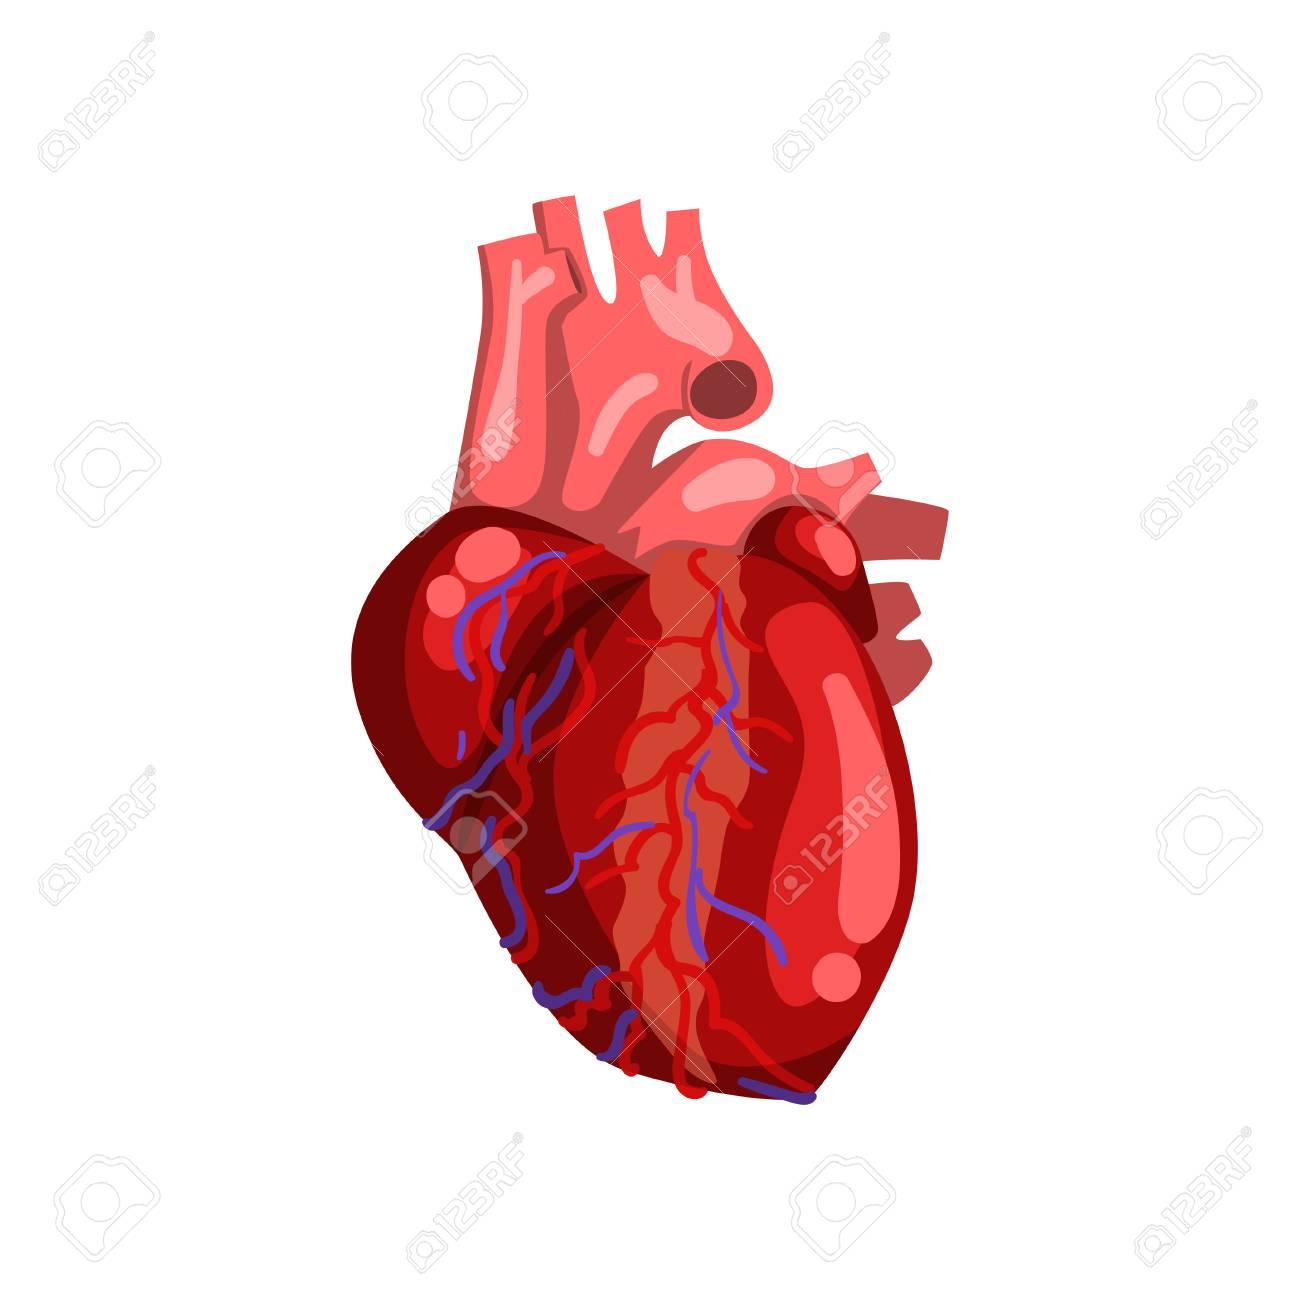 Human Heart Internal Organ Anatomy Vector Illustration On A